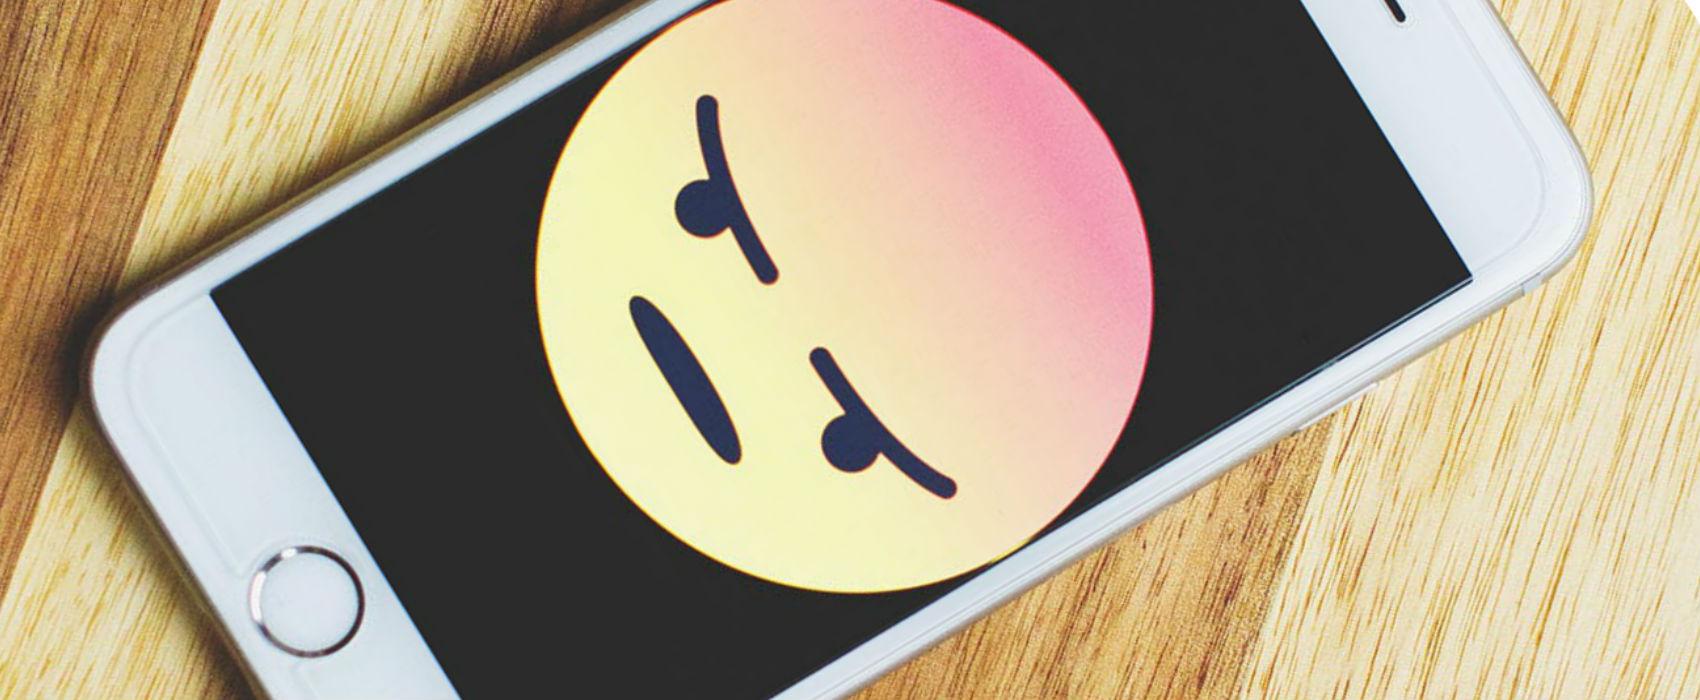 angry emoji on smartphone